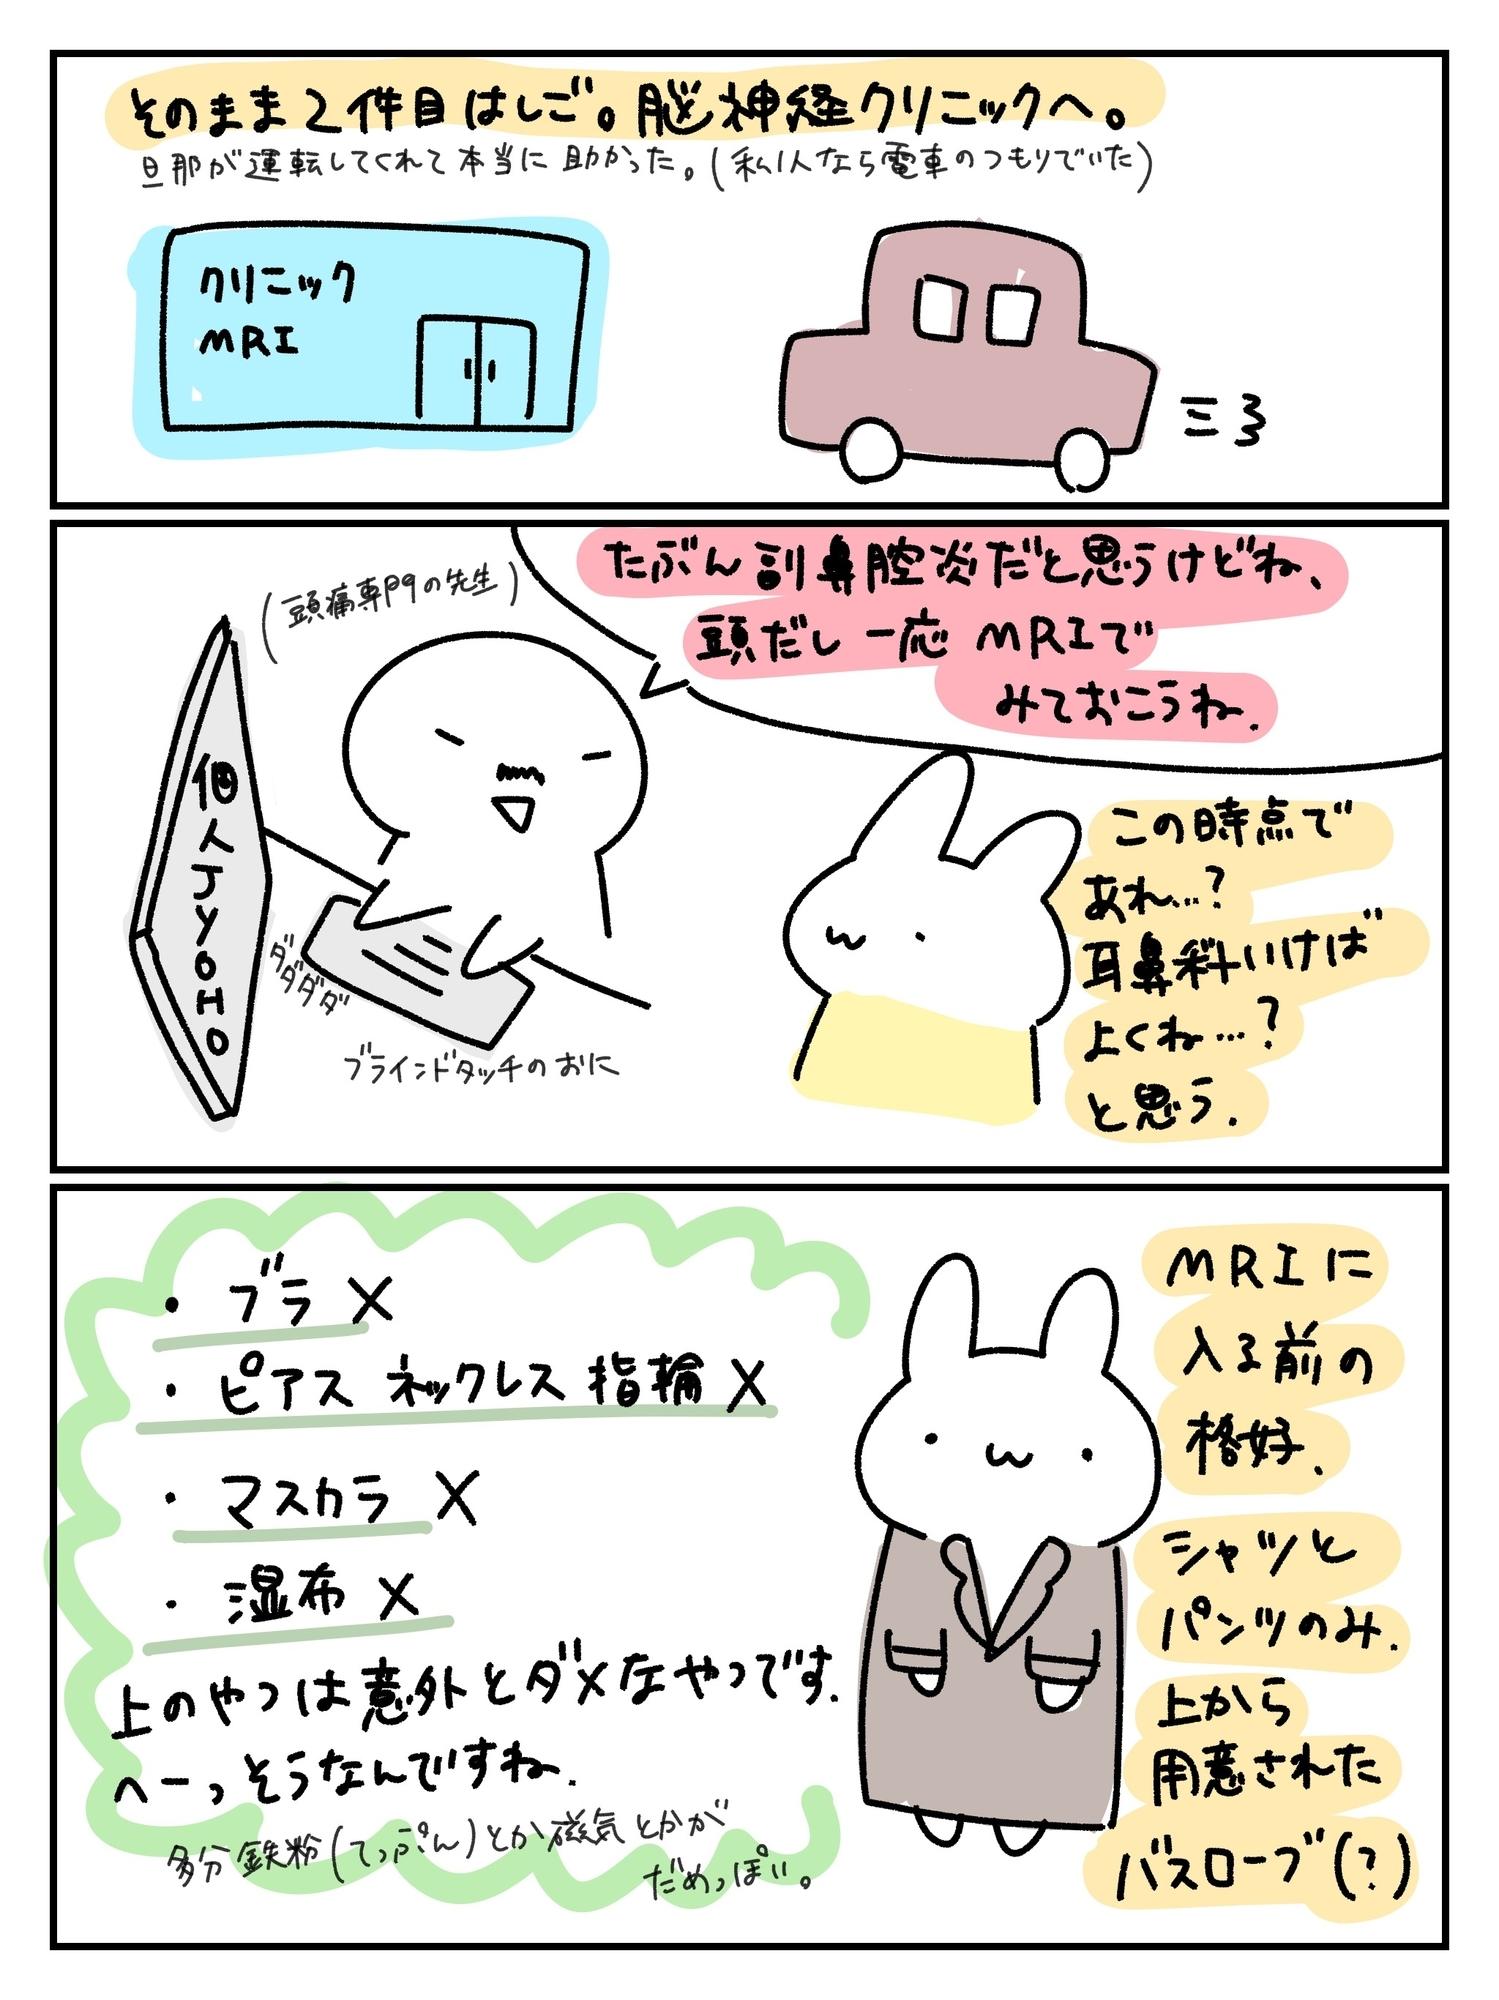 f:id:kinokino-mixtwins:20190506074856j:image